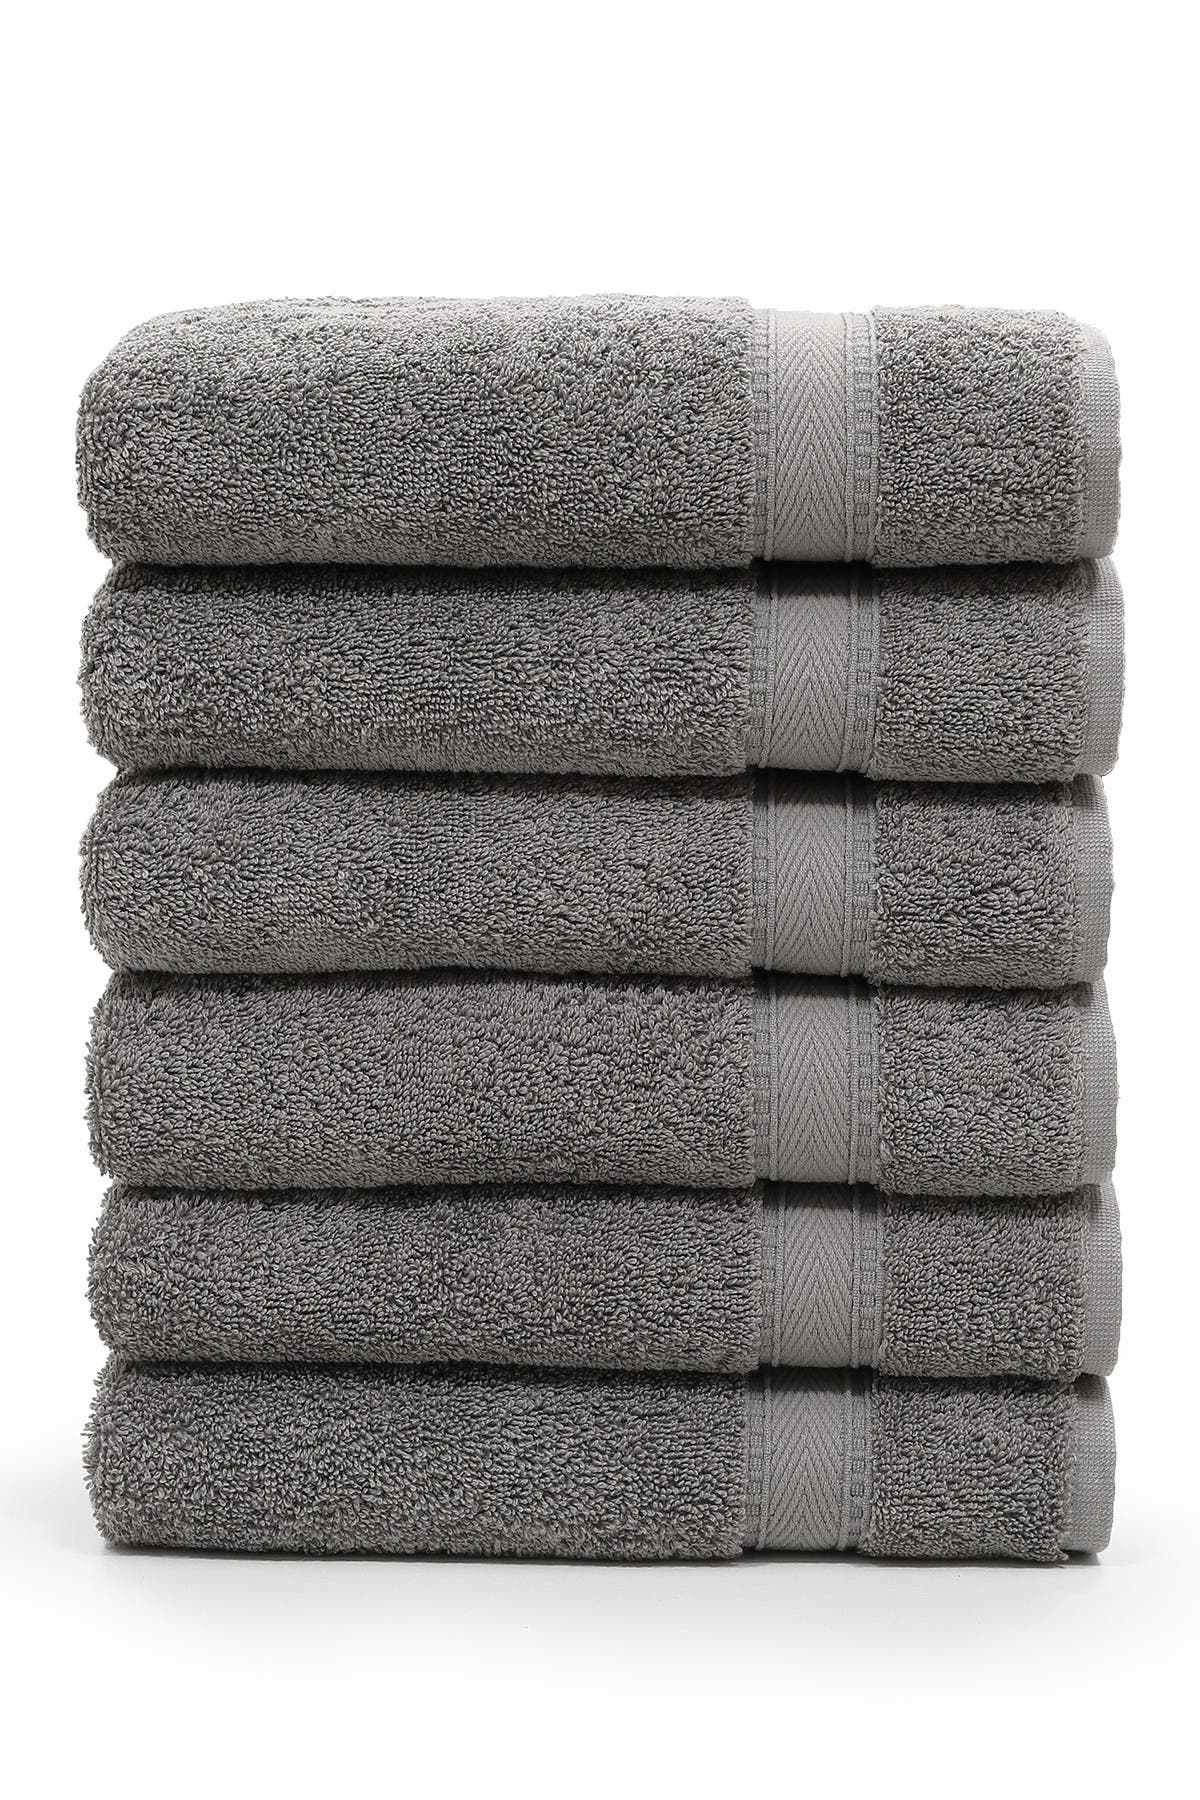 Image of LINUM HOME Sinemis Terry Hand Towels - Set of 6 - Dark Grey